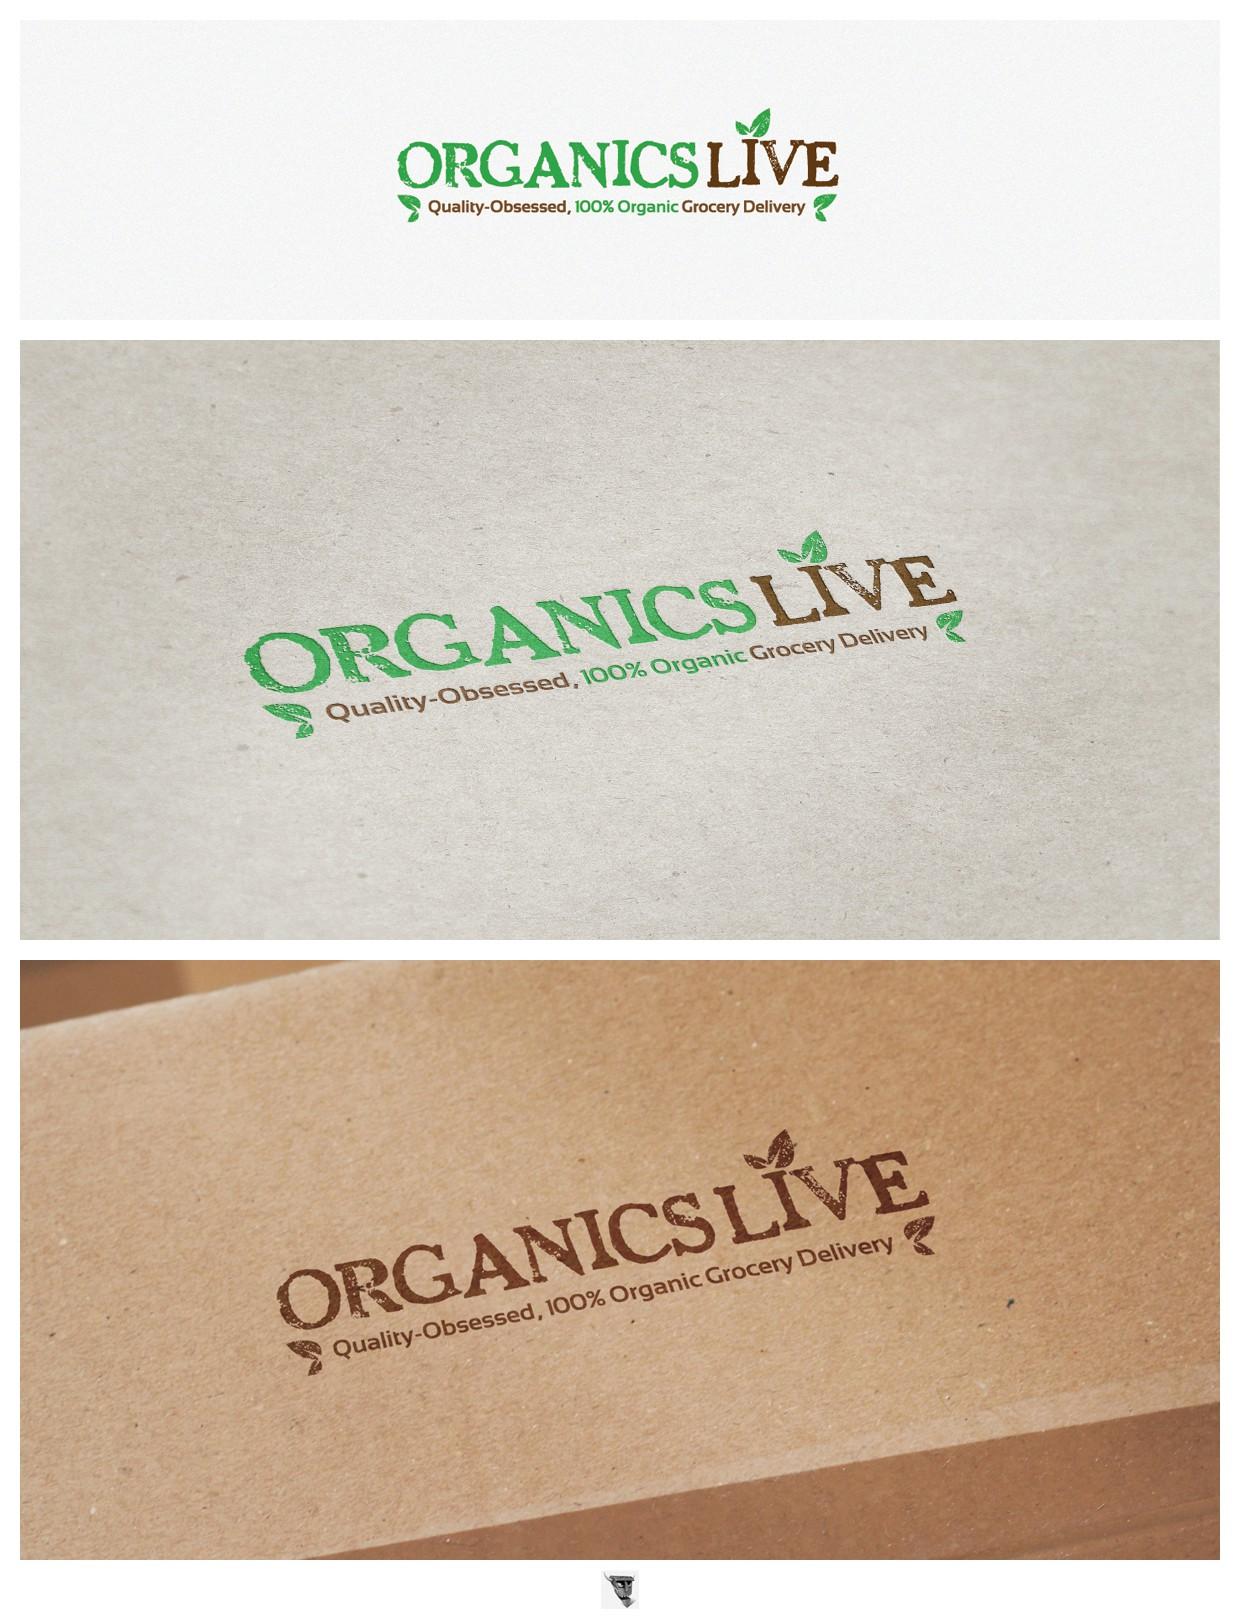 Organics Live needs a new logo